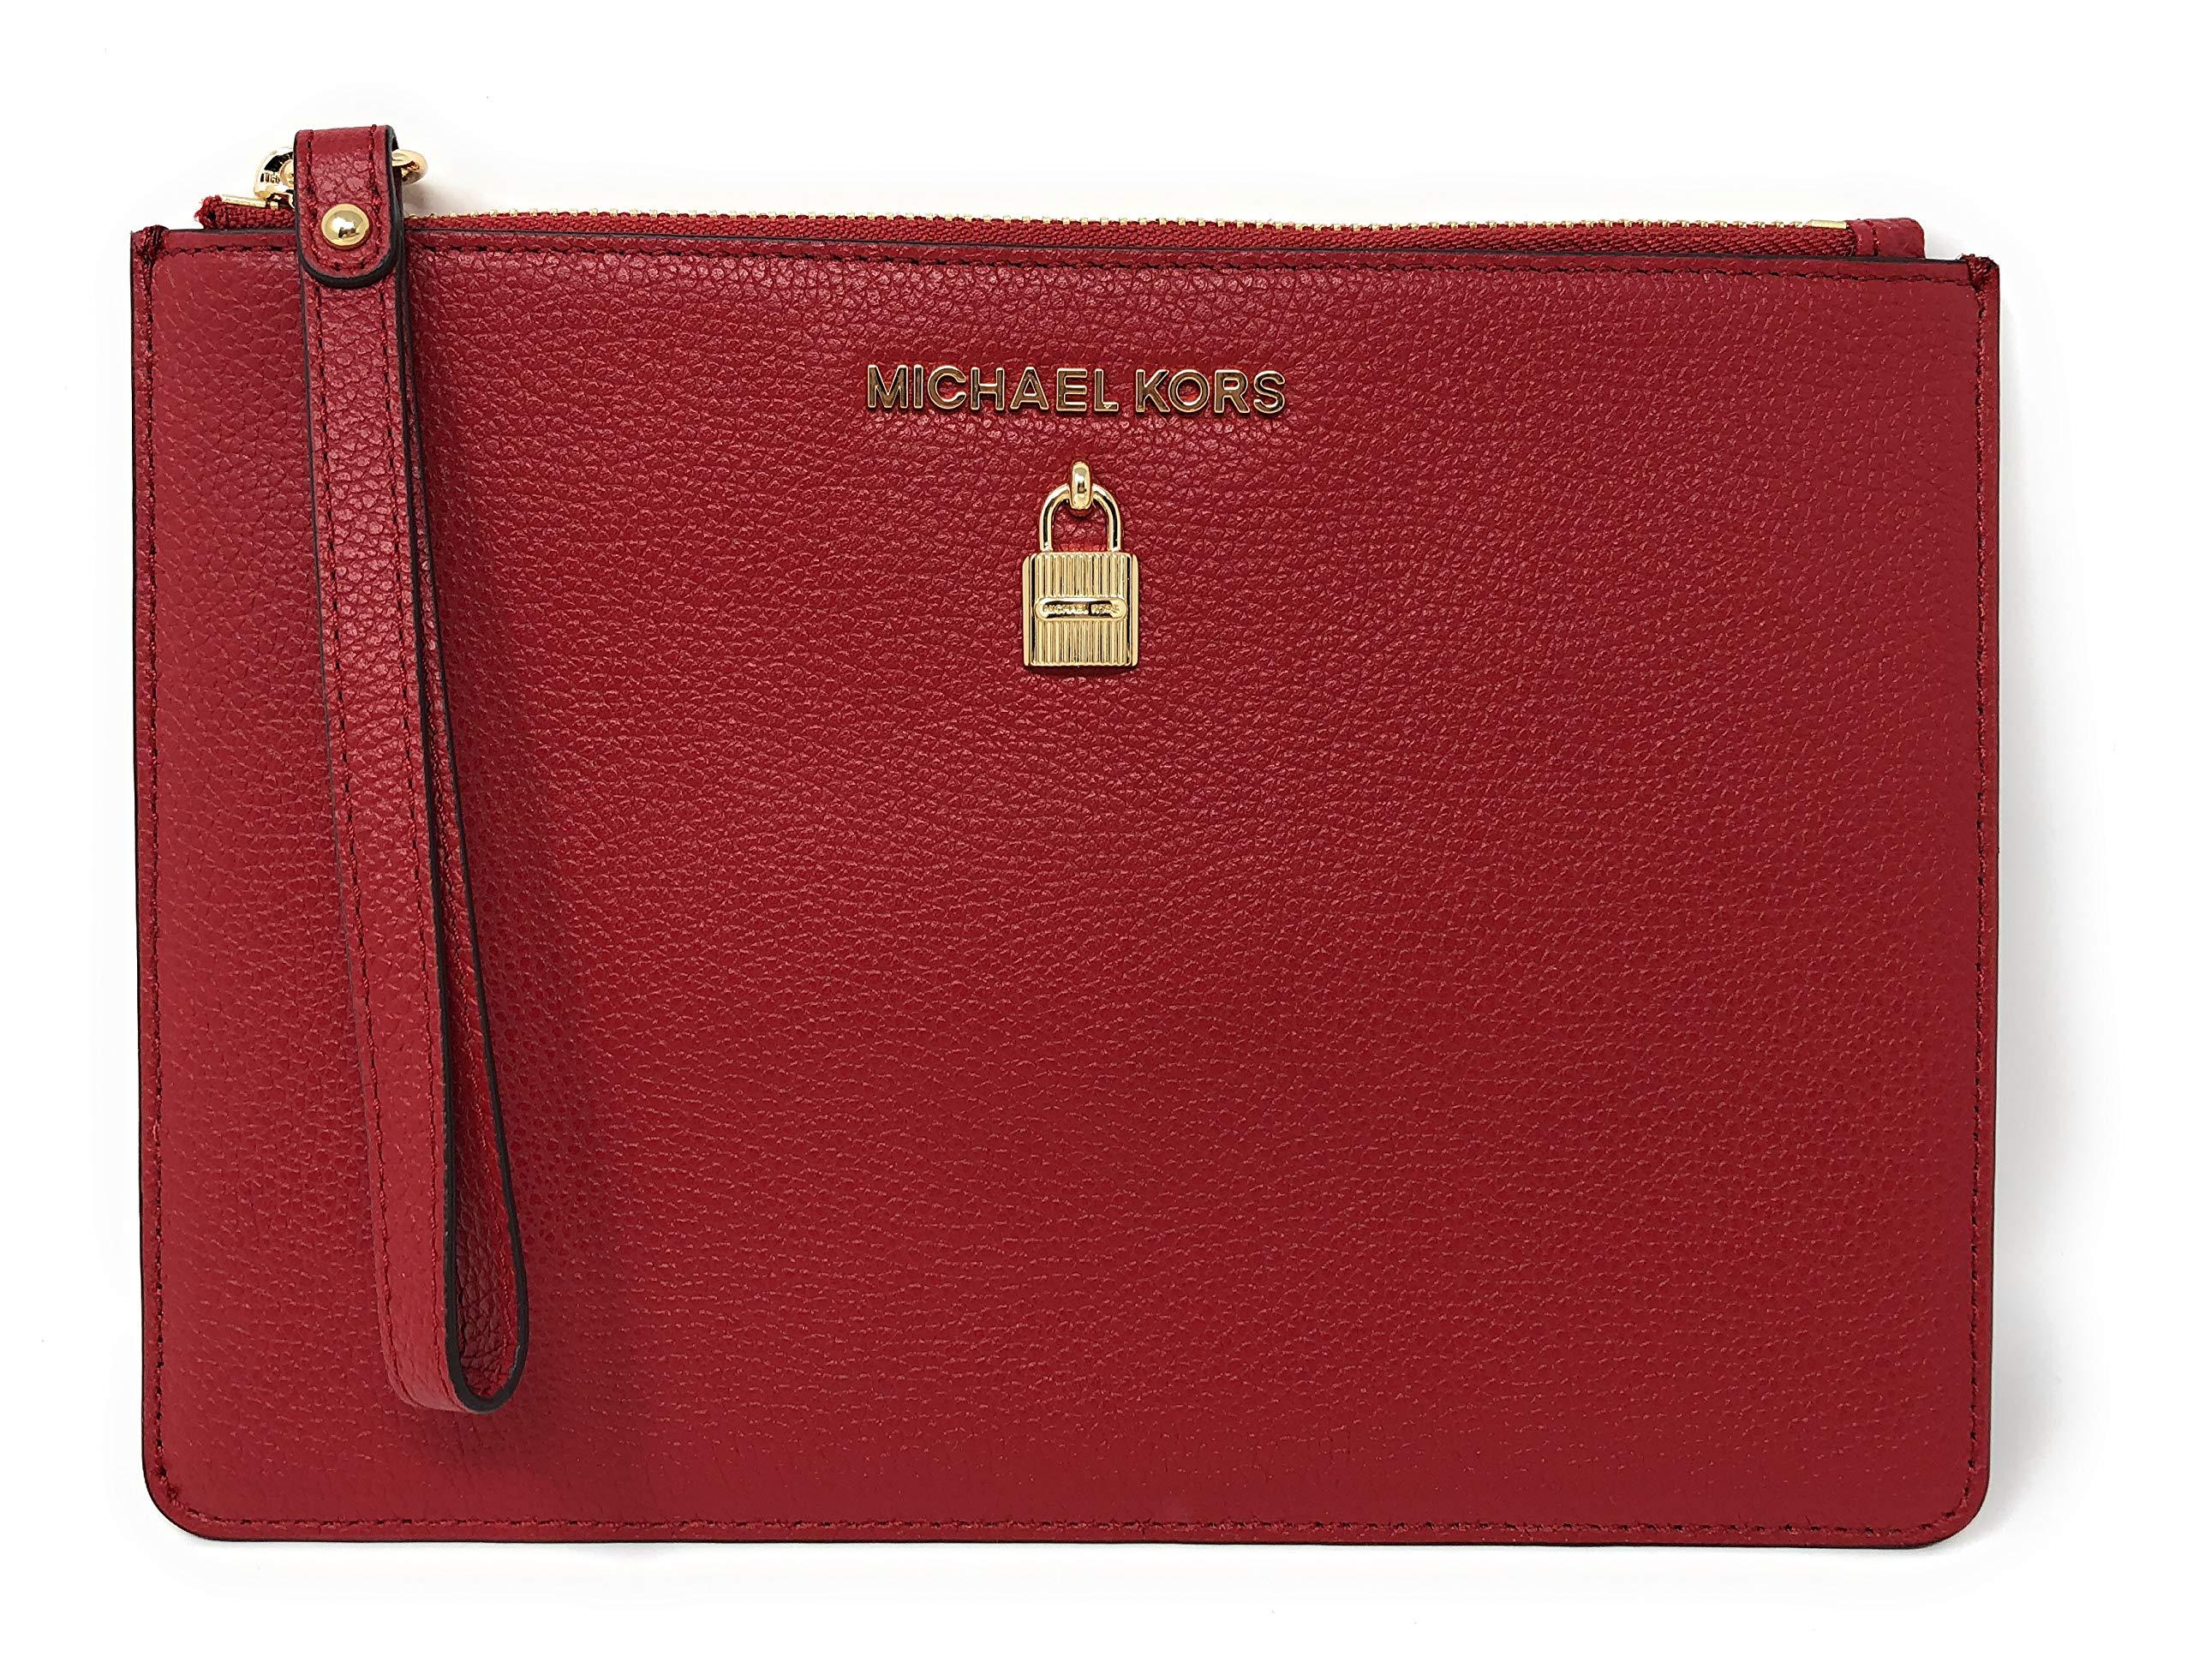 Michael Kors Adele XL Large Zip Leather Clutch Wristlet Purse in Scarlet